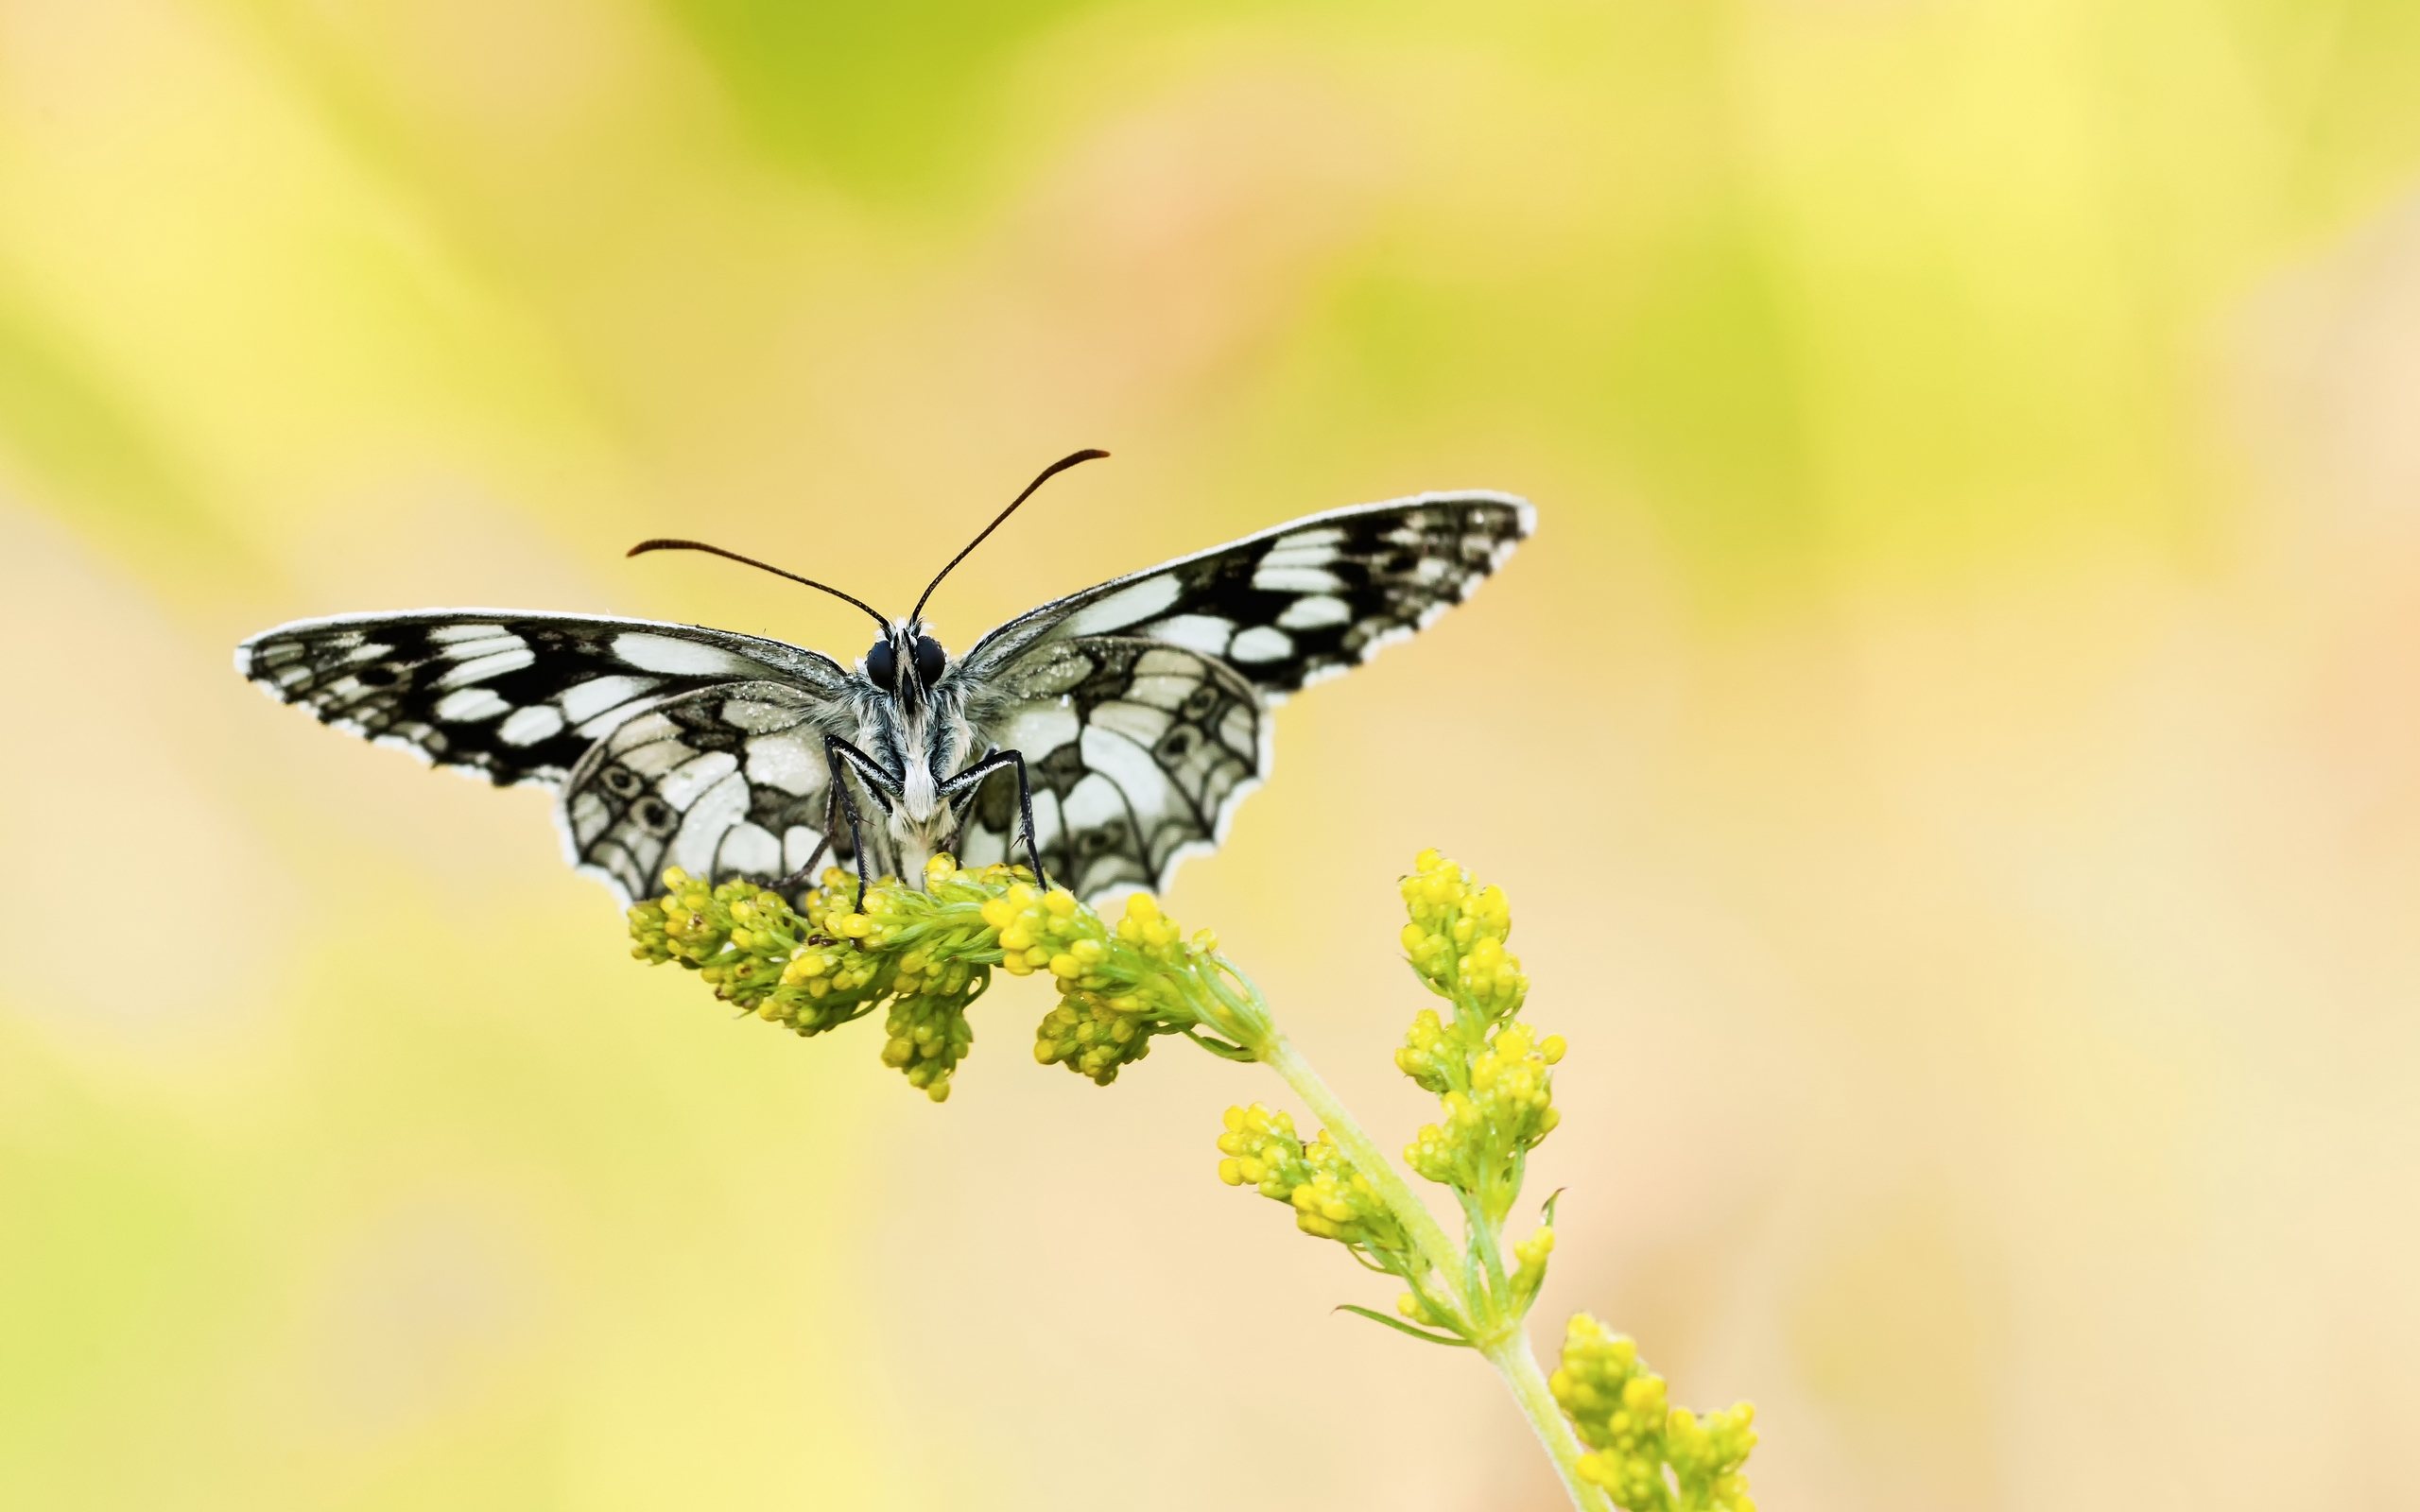 бабочка, крылья, глаза